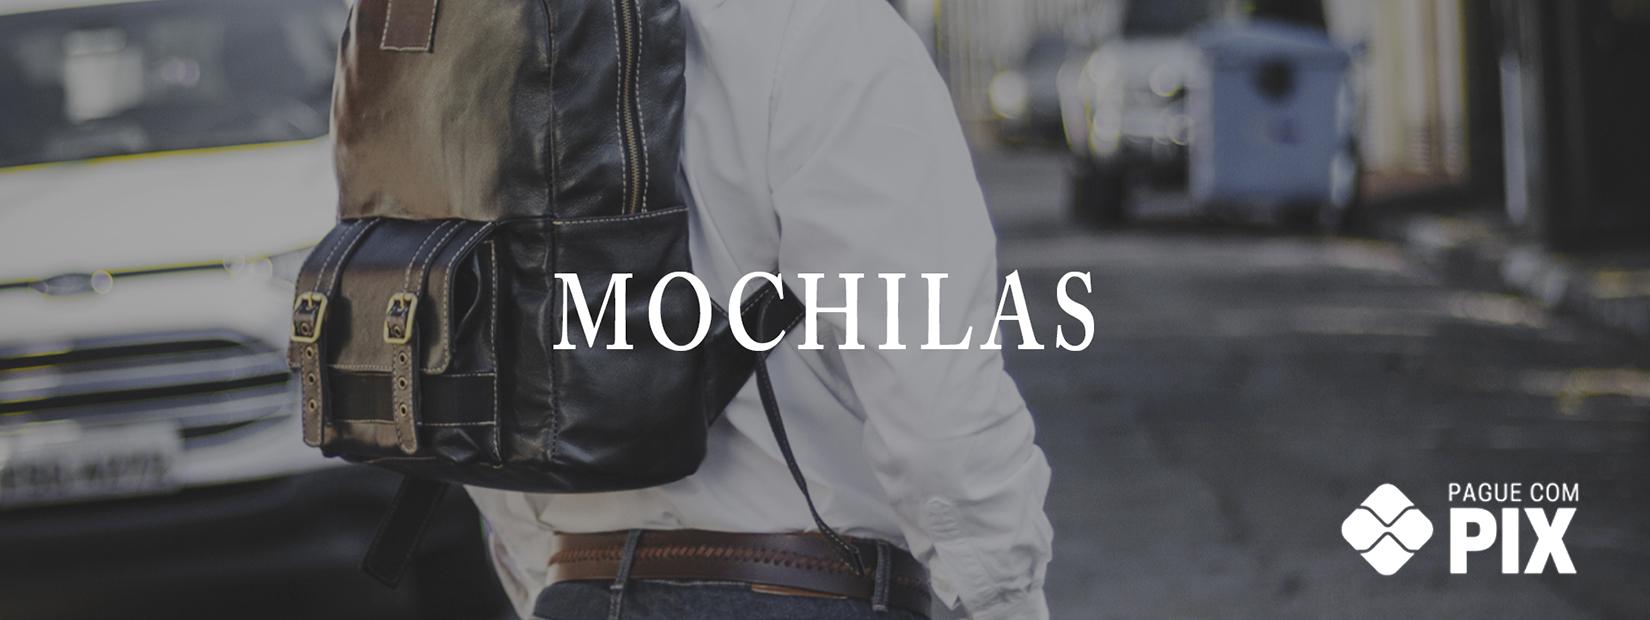 CATEGORIA - MOCHILA